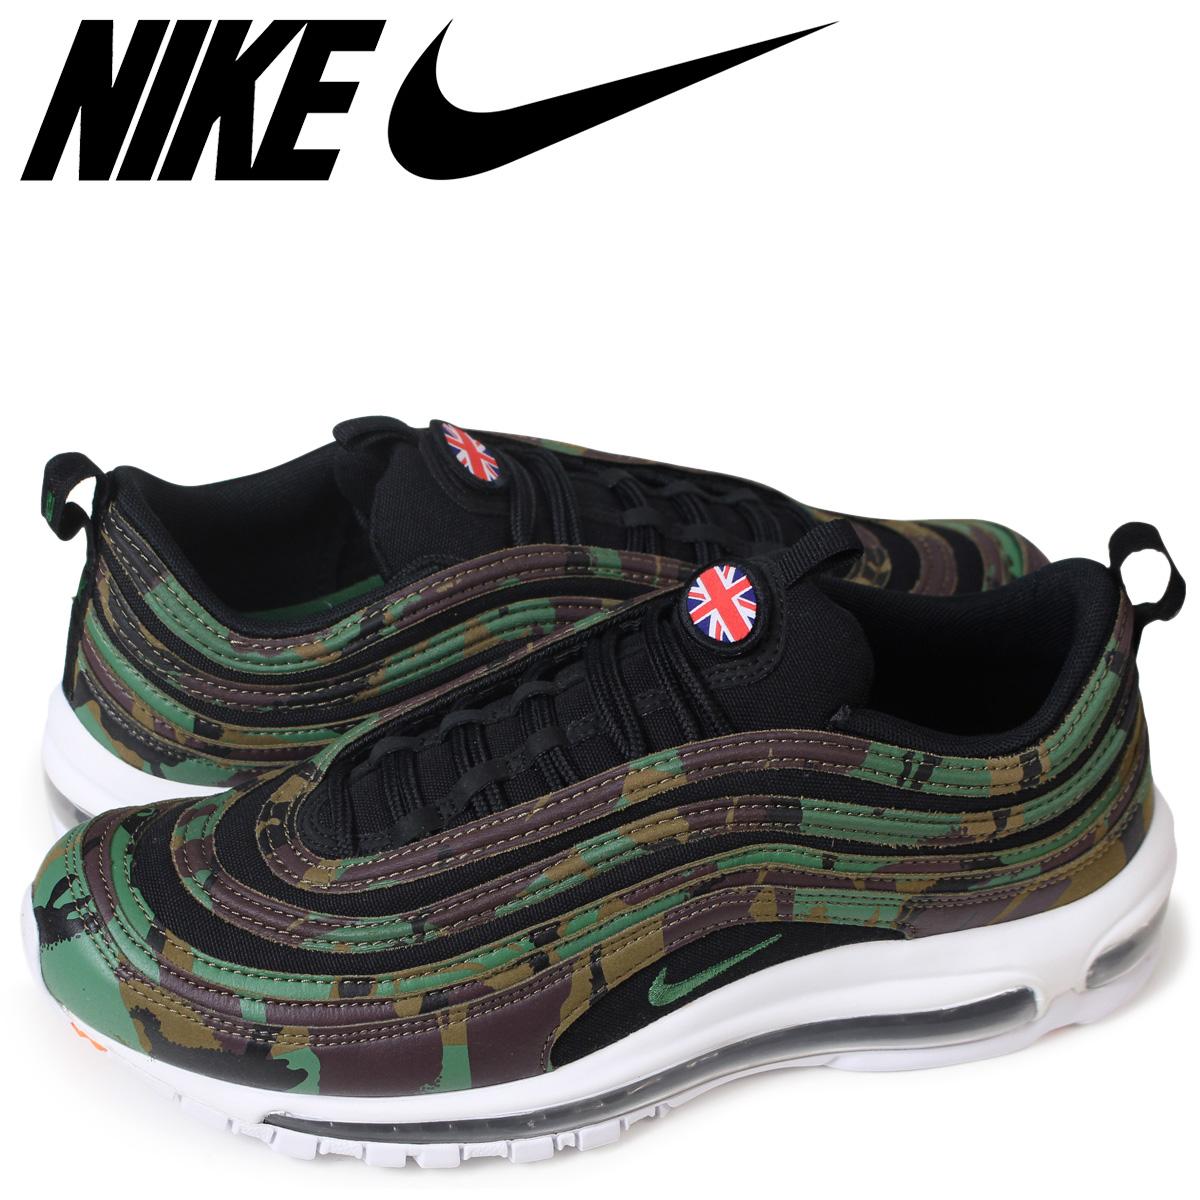 online store 507e1 5fb7a ... norway nike air max 97 og uk camo kie ney amax 97 sneakers men aj2614  201 ...